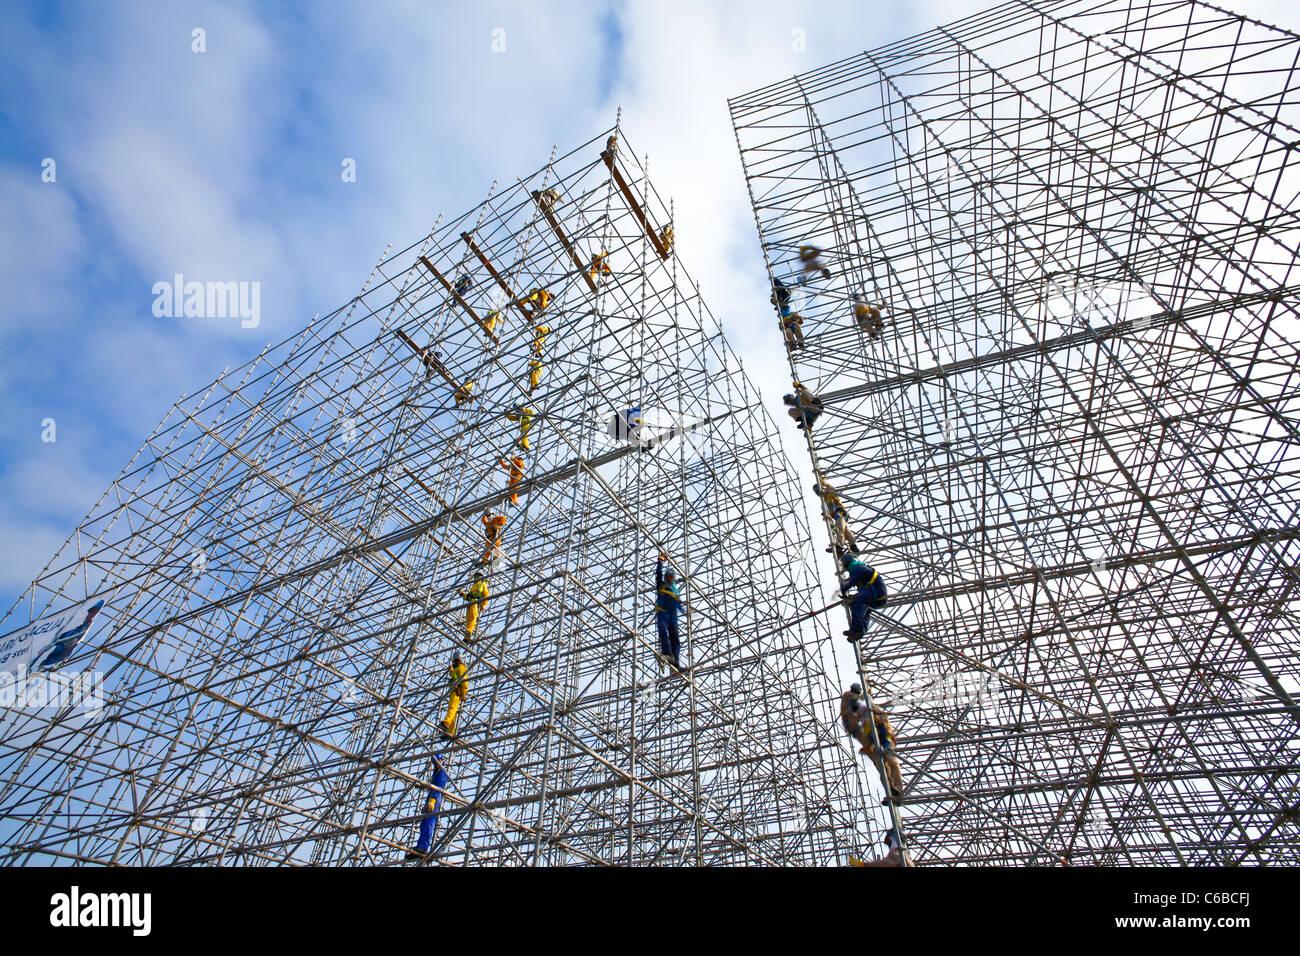 Katar, Naher Osten, Arabische Halbinsel, Doha, Gerüstbau in Central Doha errichtet Stockbild